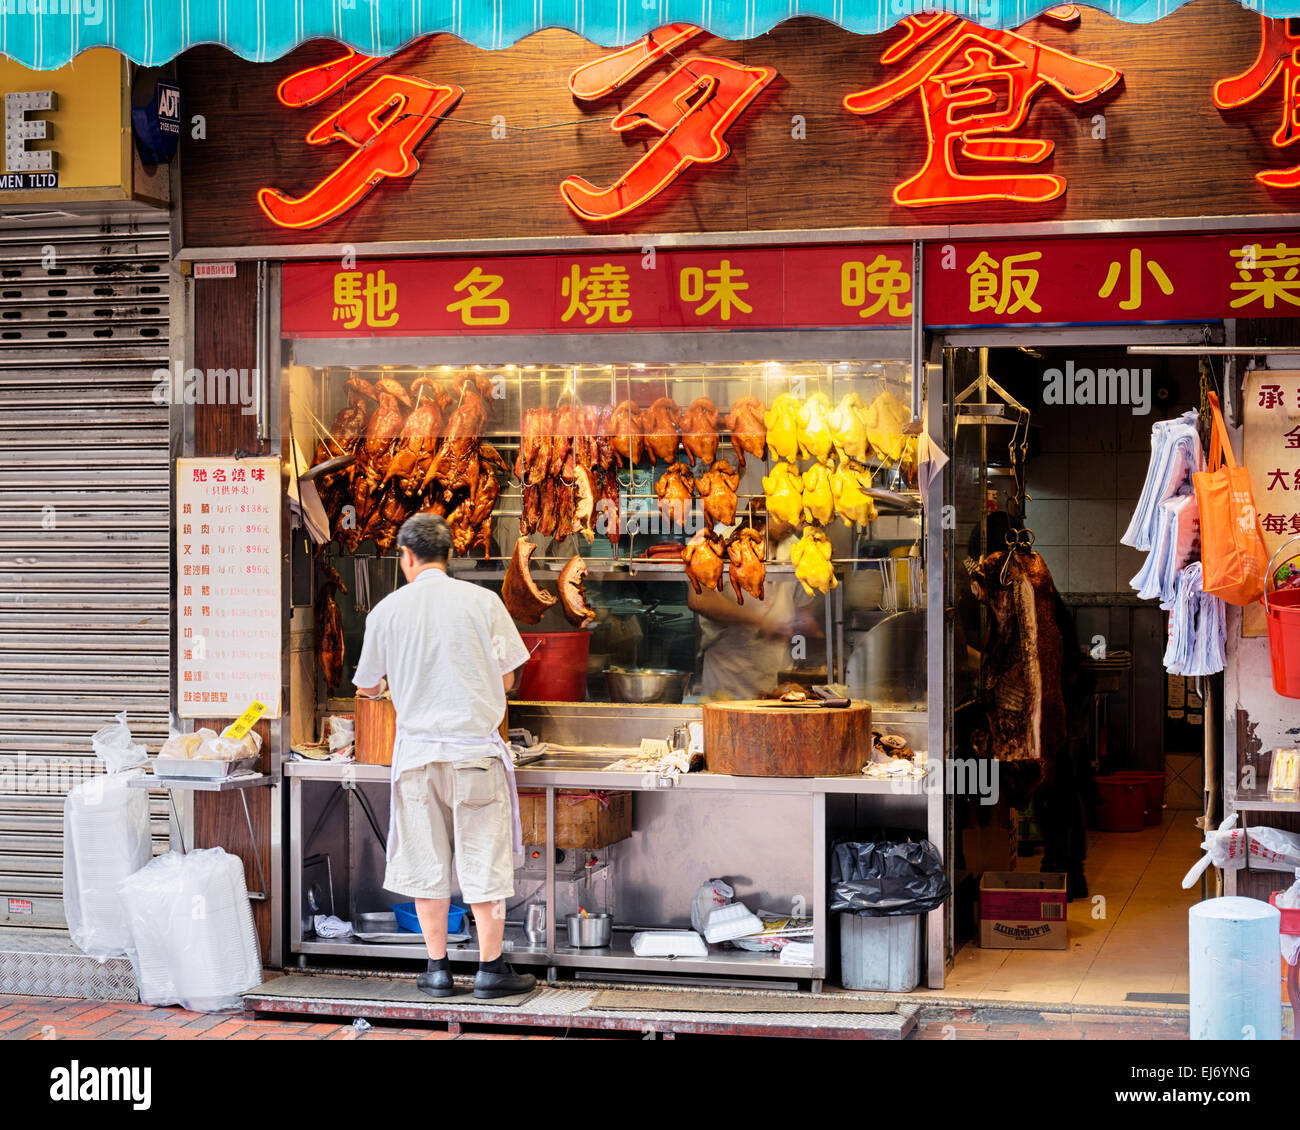 Hong Kong, Hong Kong SAR -November 12, 2014: Roast cantonese ducks and another rosted meat in a windows display - Stock Image